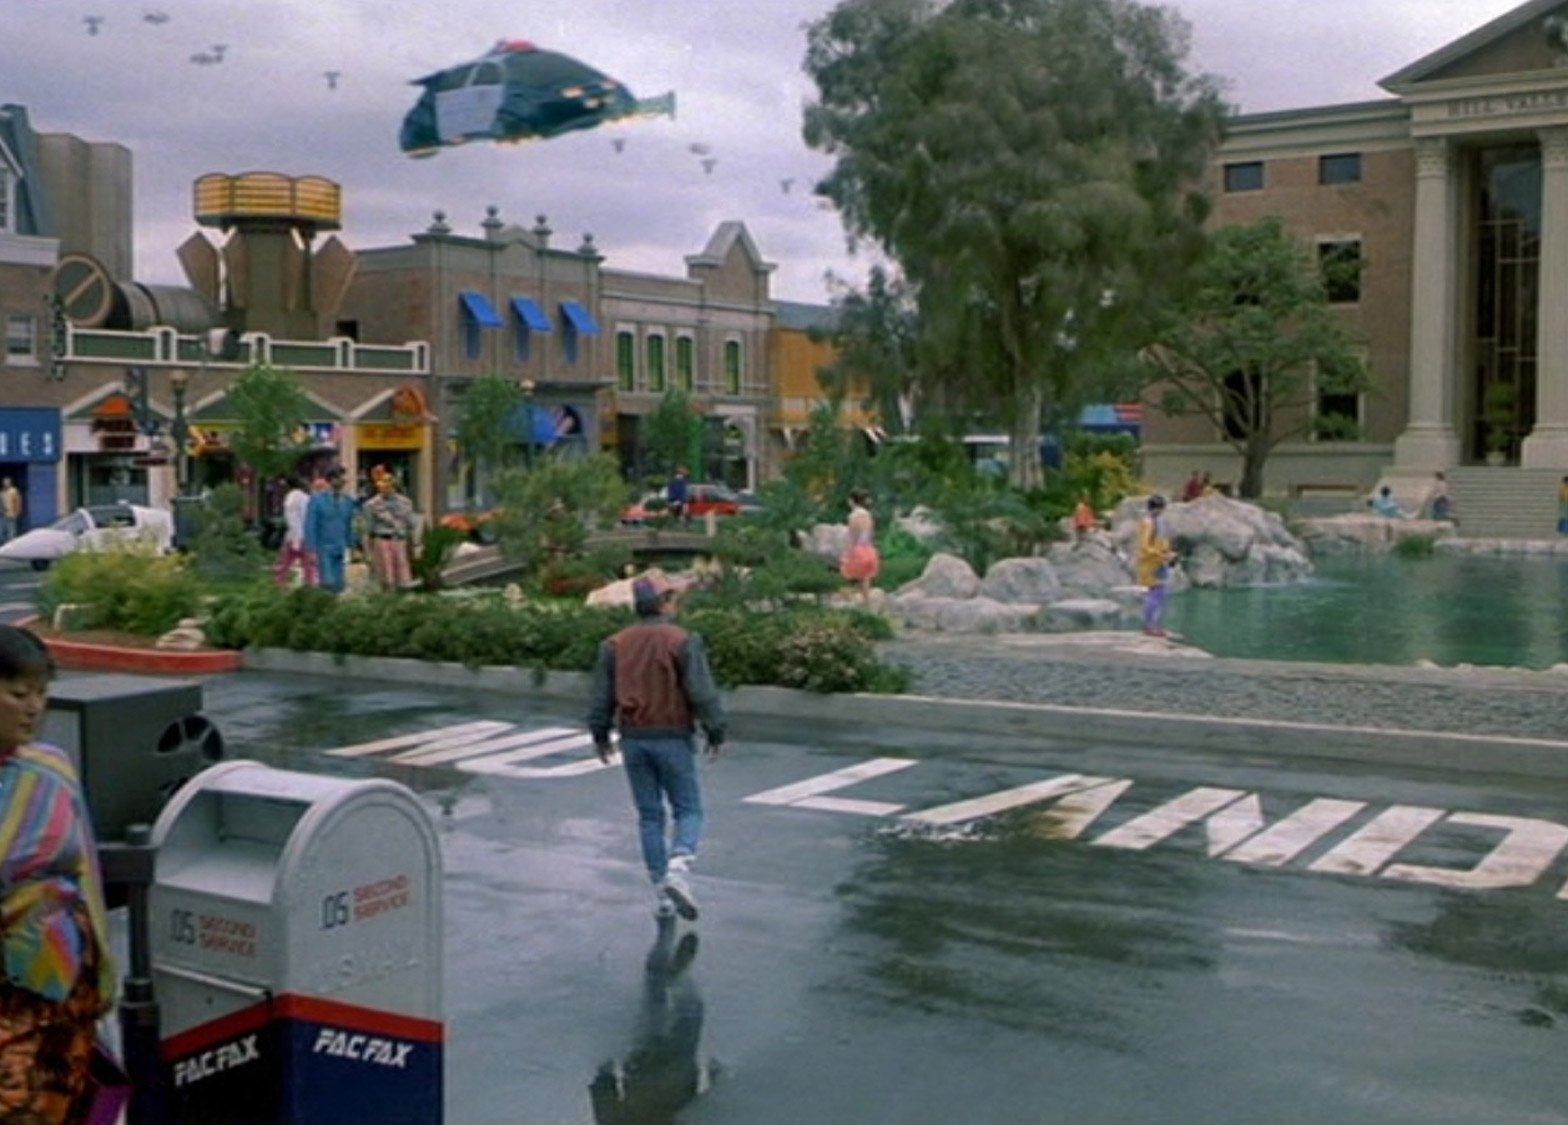 future flying skateboards